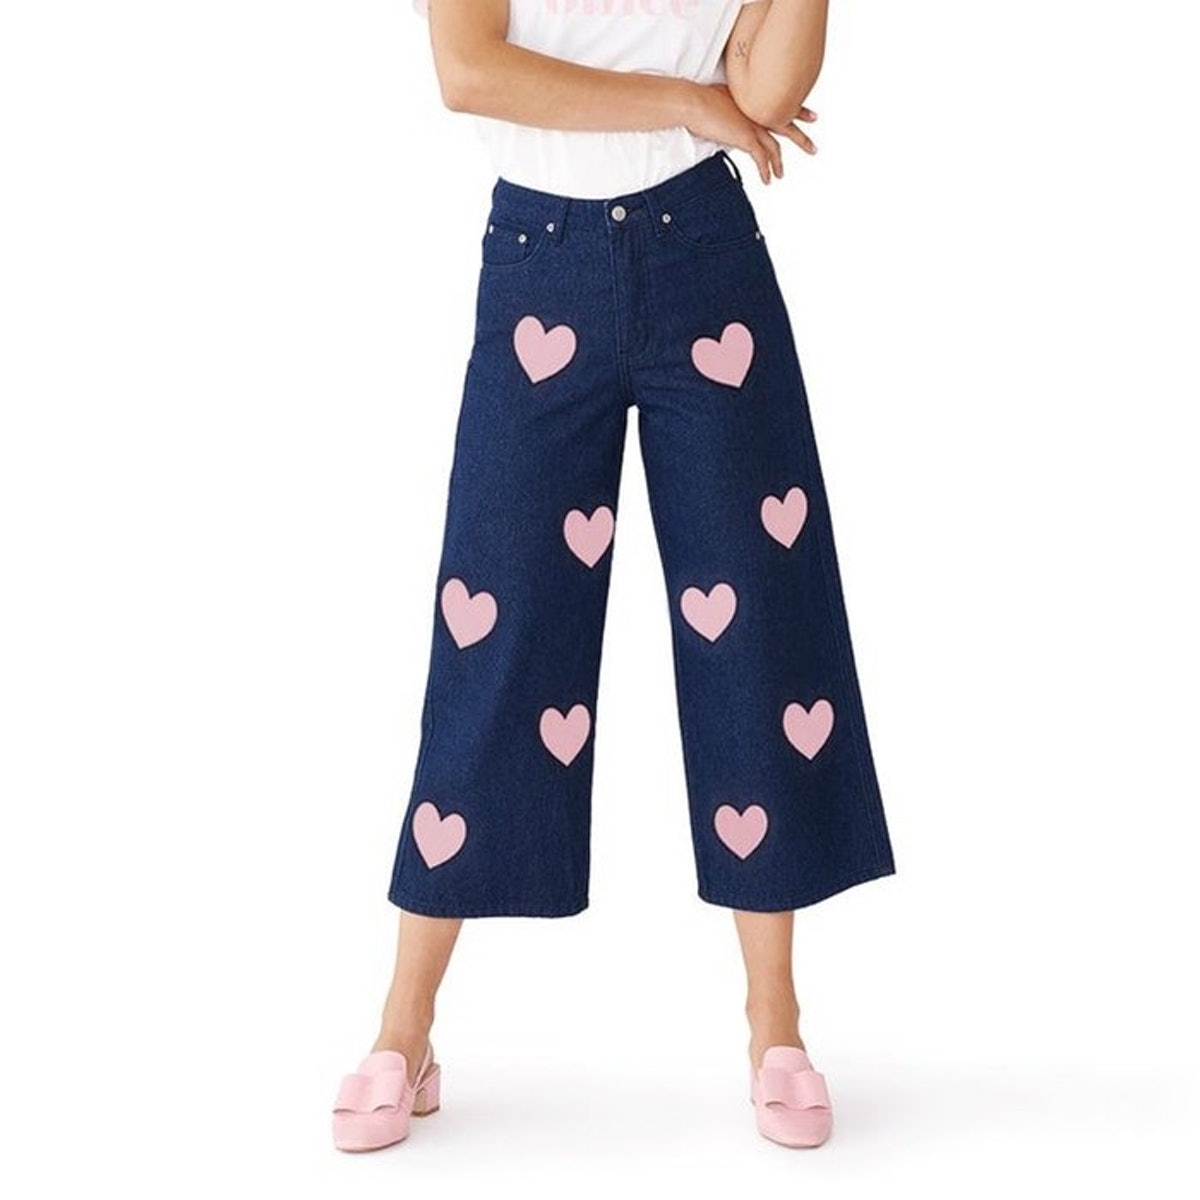 Lazy Oaf Heart Jeans